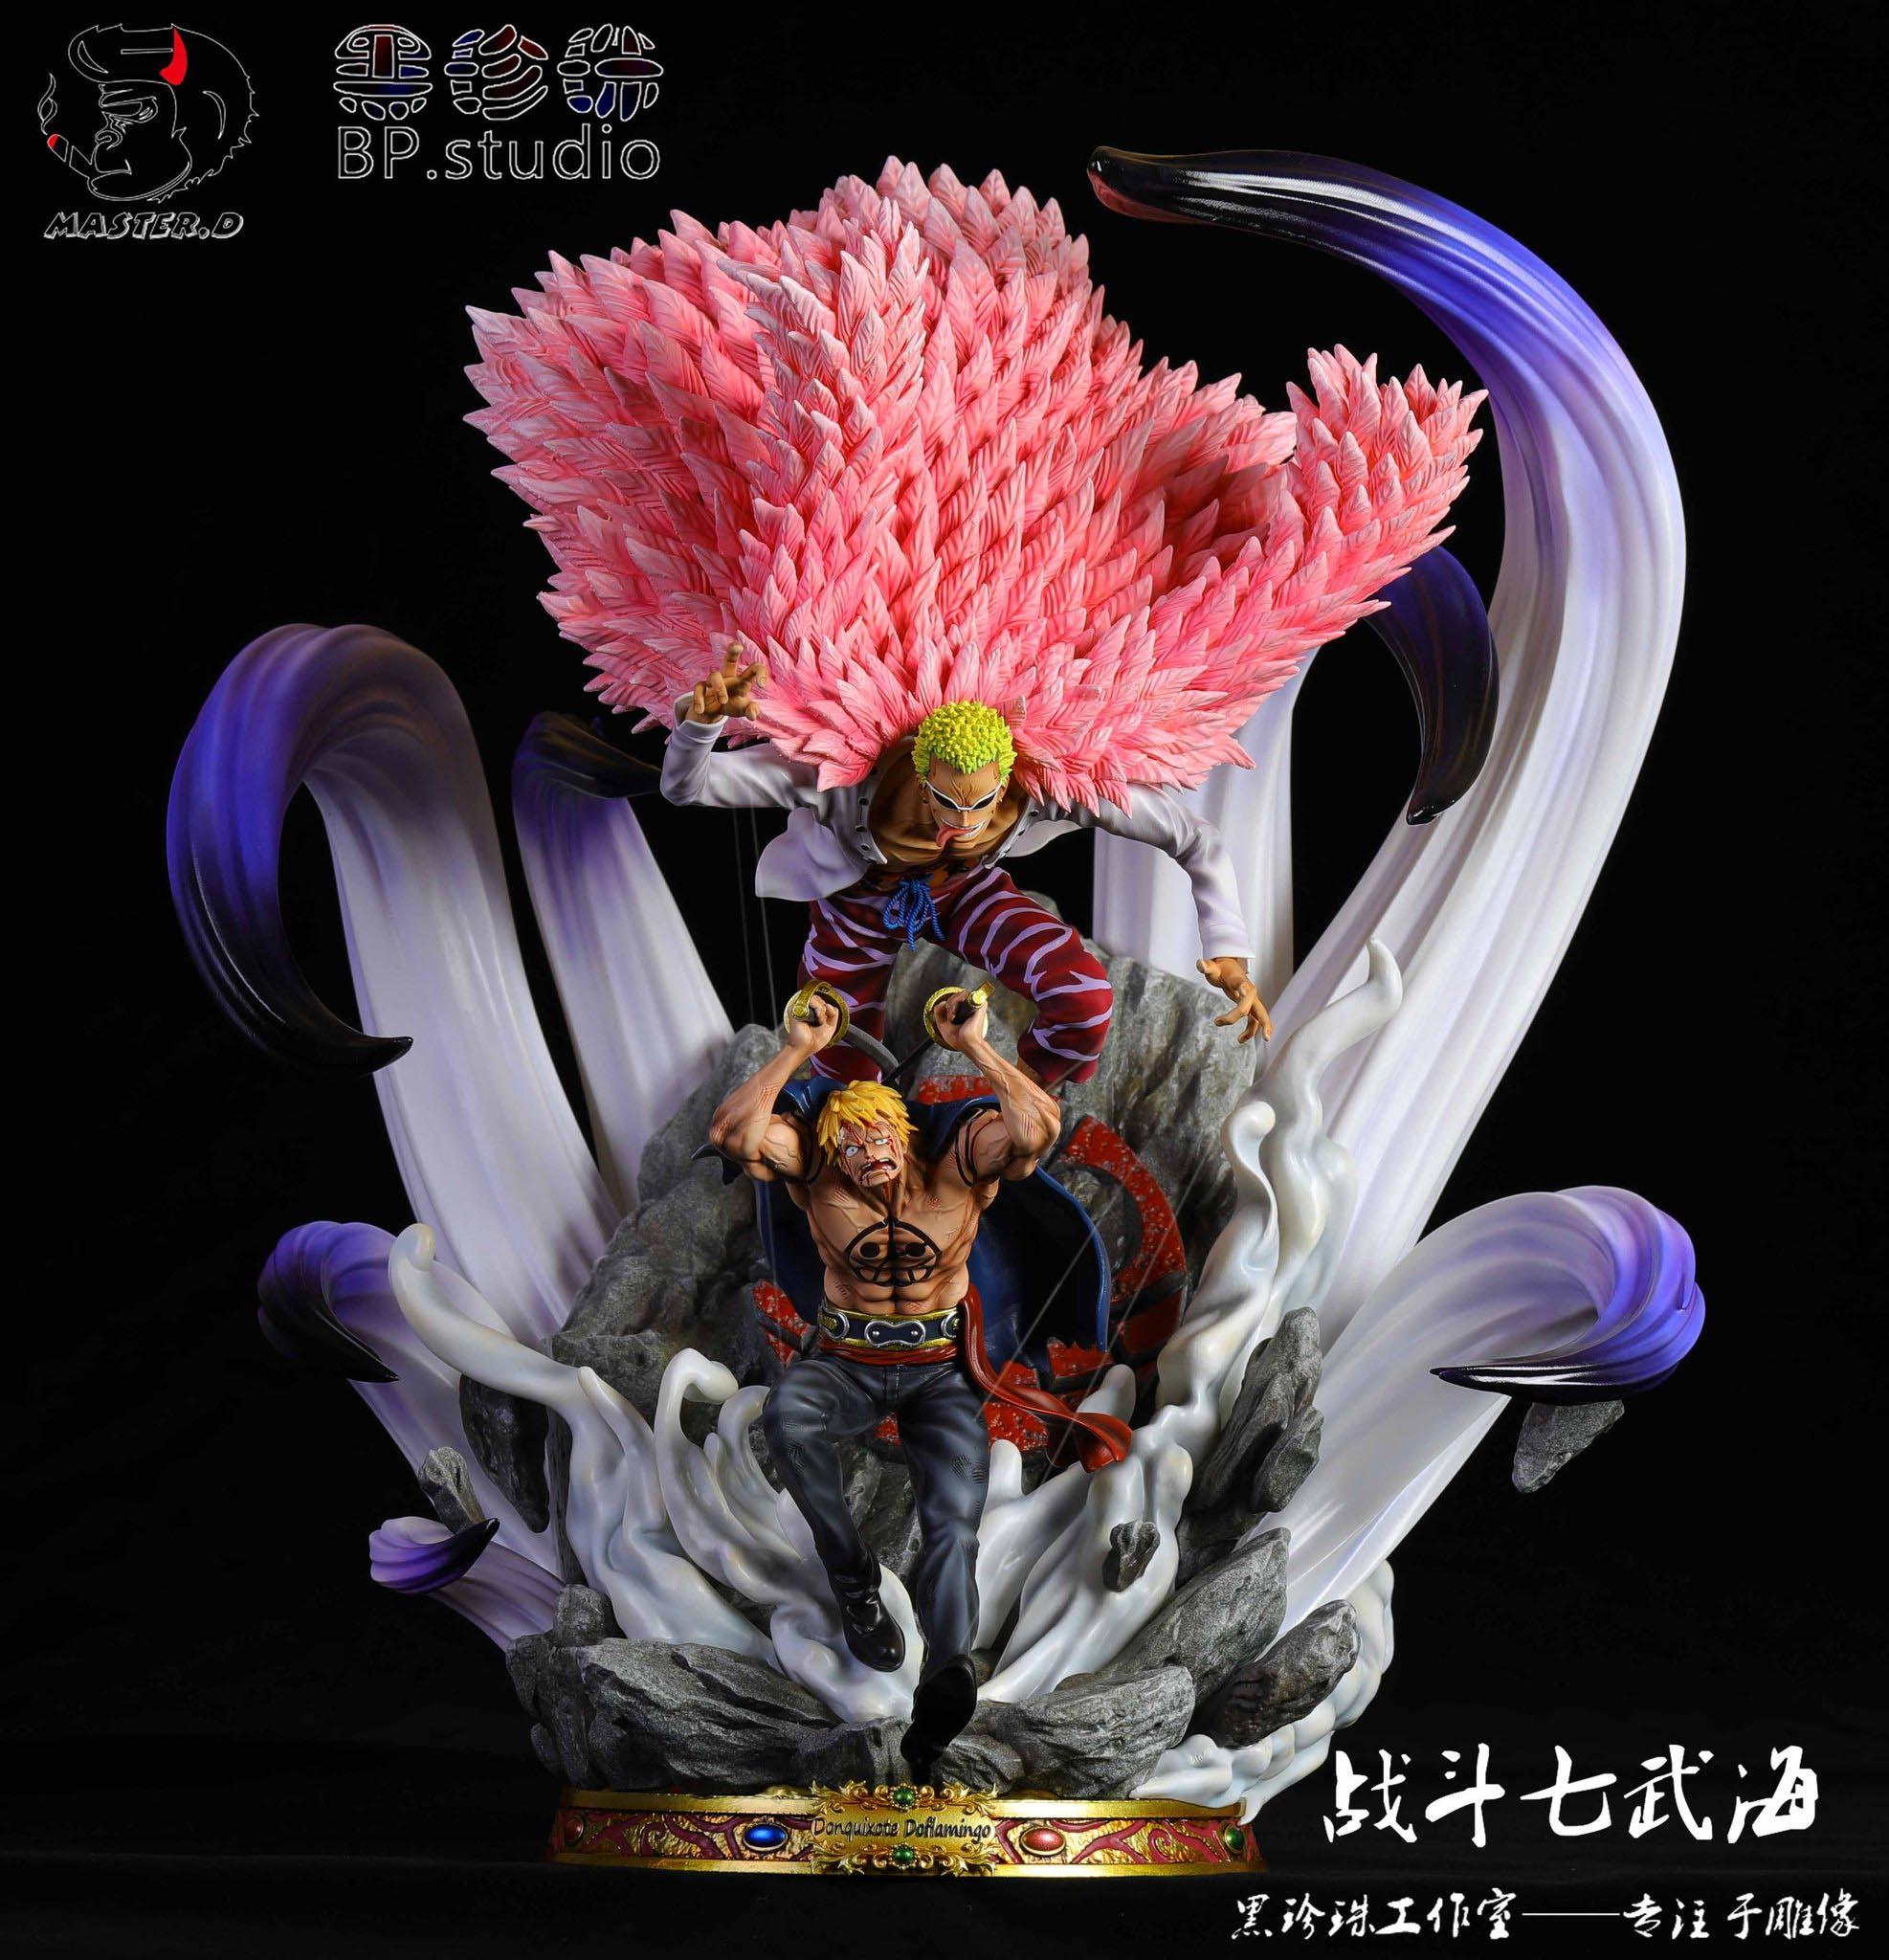 One-Piece-Doflamingo-Bellamy-Black-Knight-Parasite-01